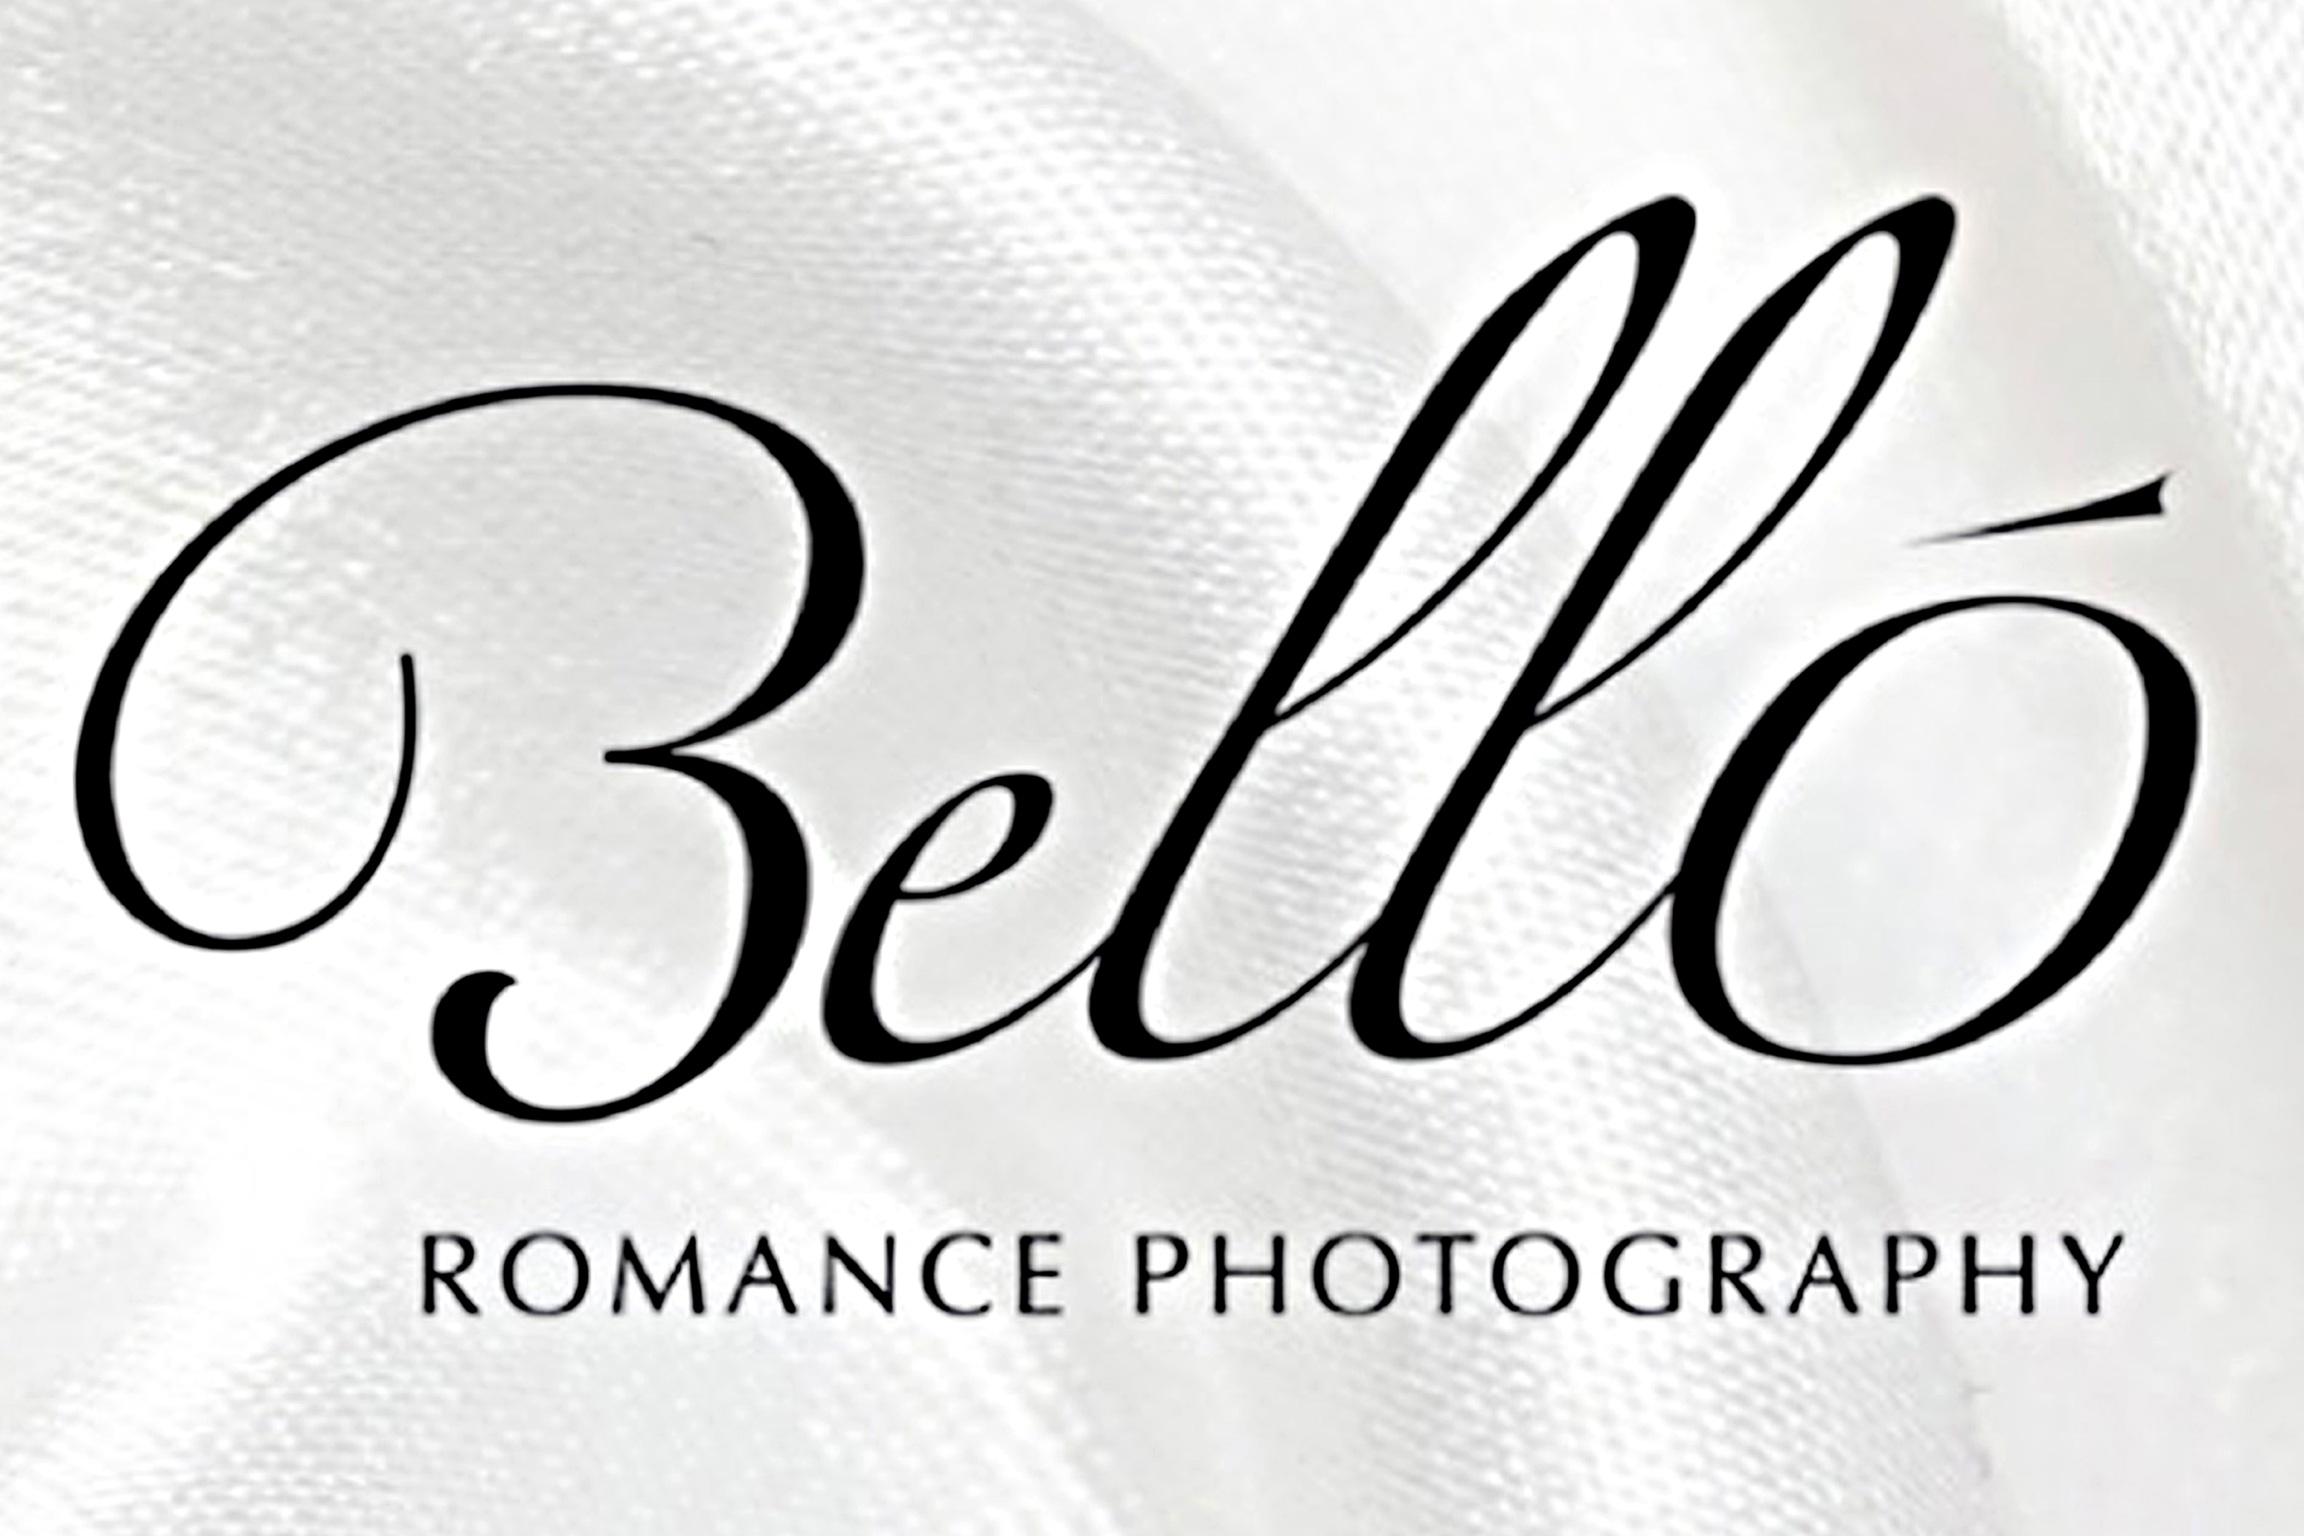 Bello_Silver_Brand 01a=24x36.JPG